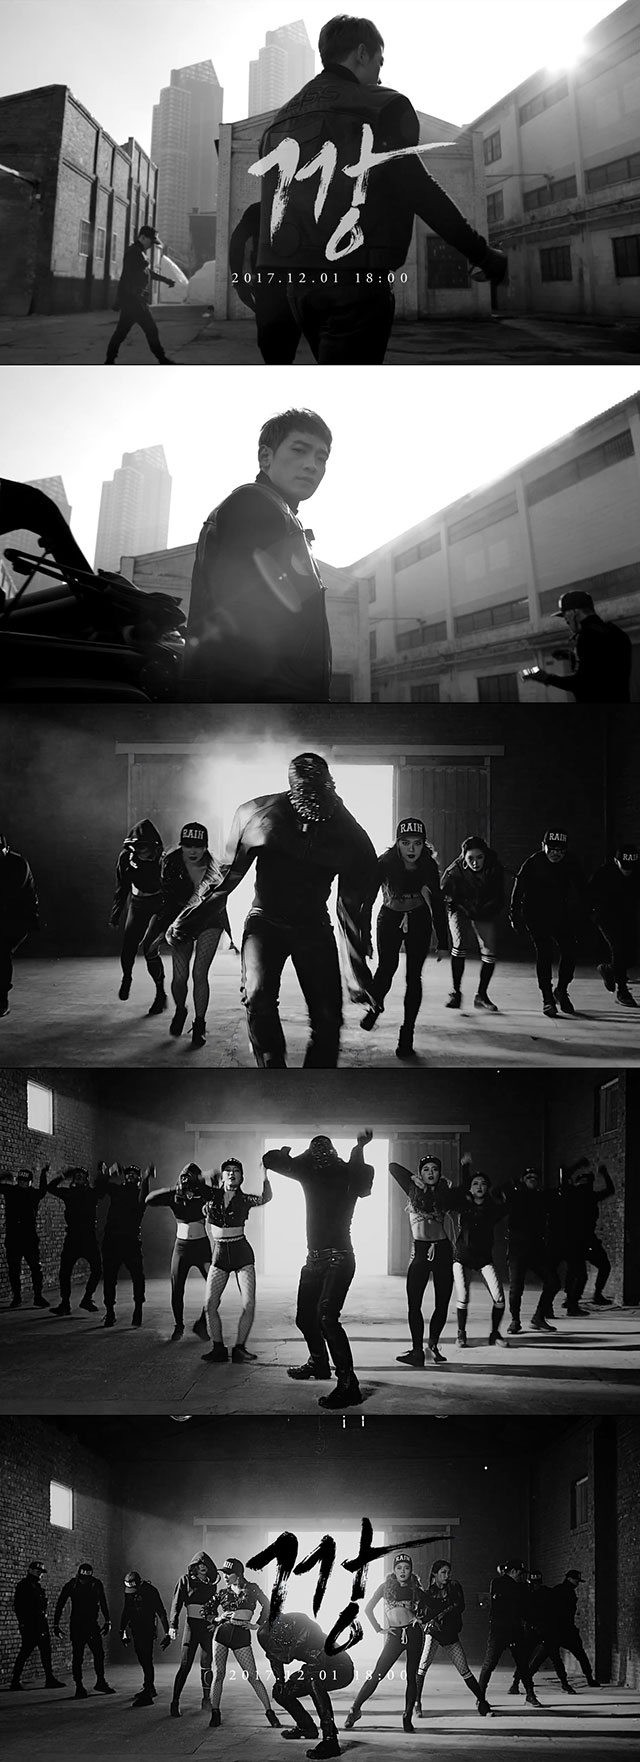 RAINの新曲『GANG』MV Teaser